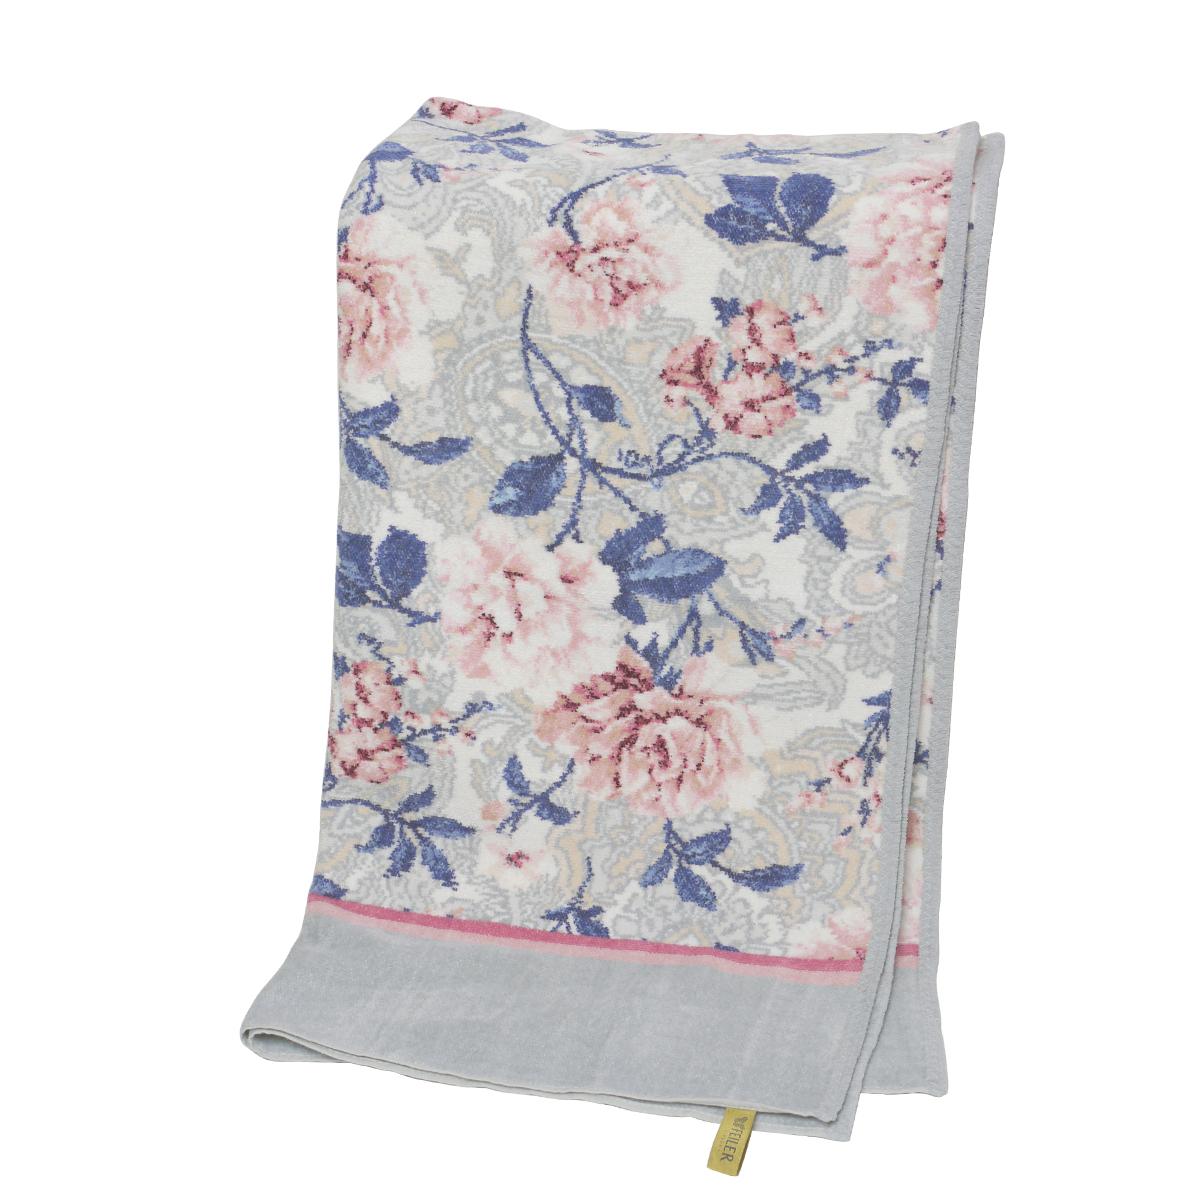 【Max1,000円OFFクーポン】フェイラー バスタオル FEILER スカーレット・パウダーピンク 75x150cm FEILER Chenille Bath Towel ギフト・のし可